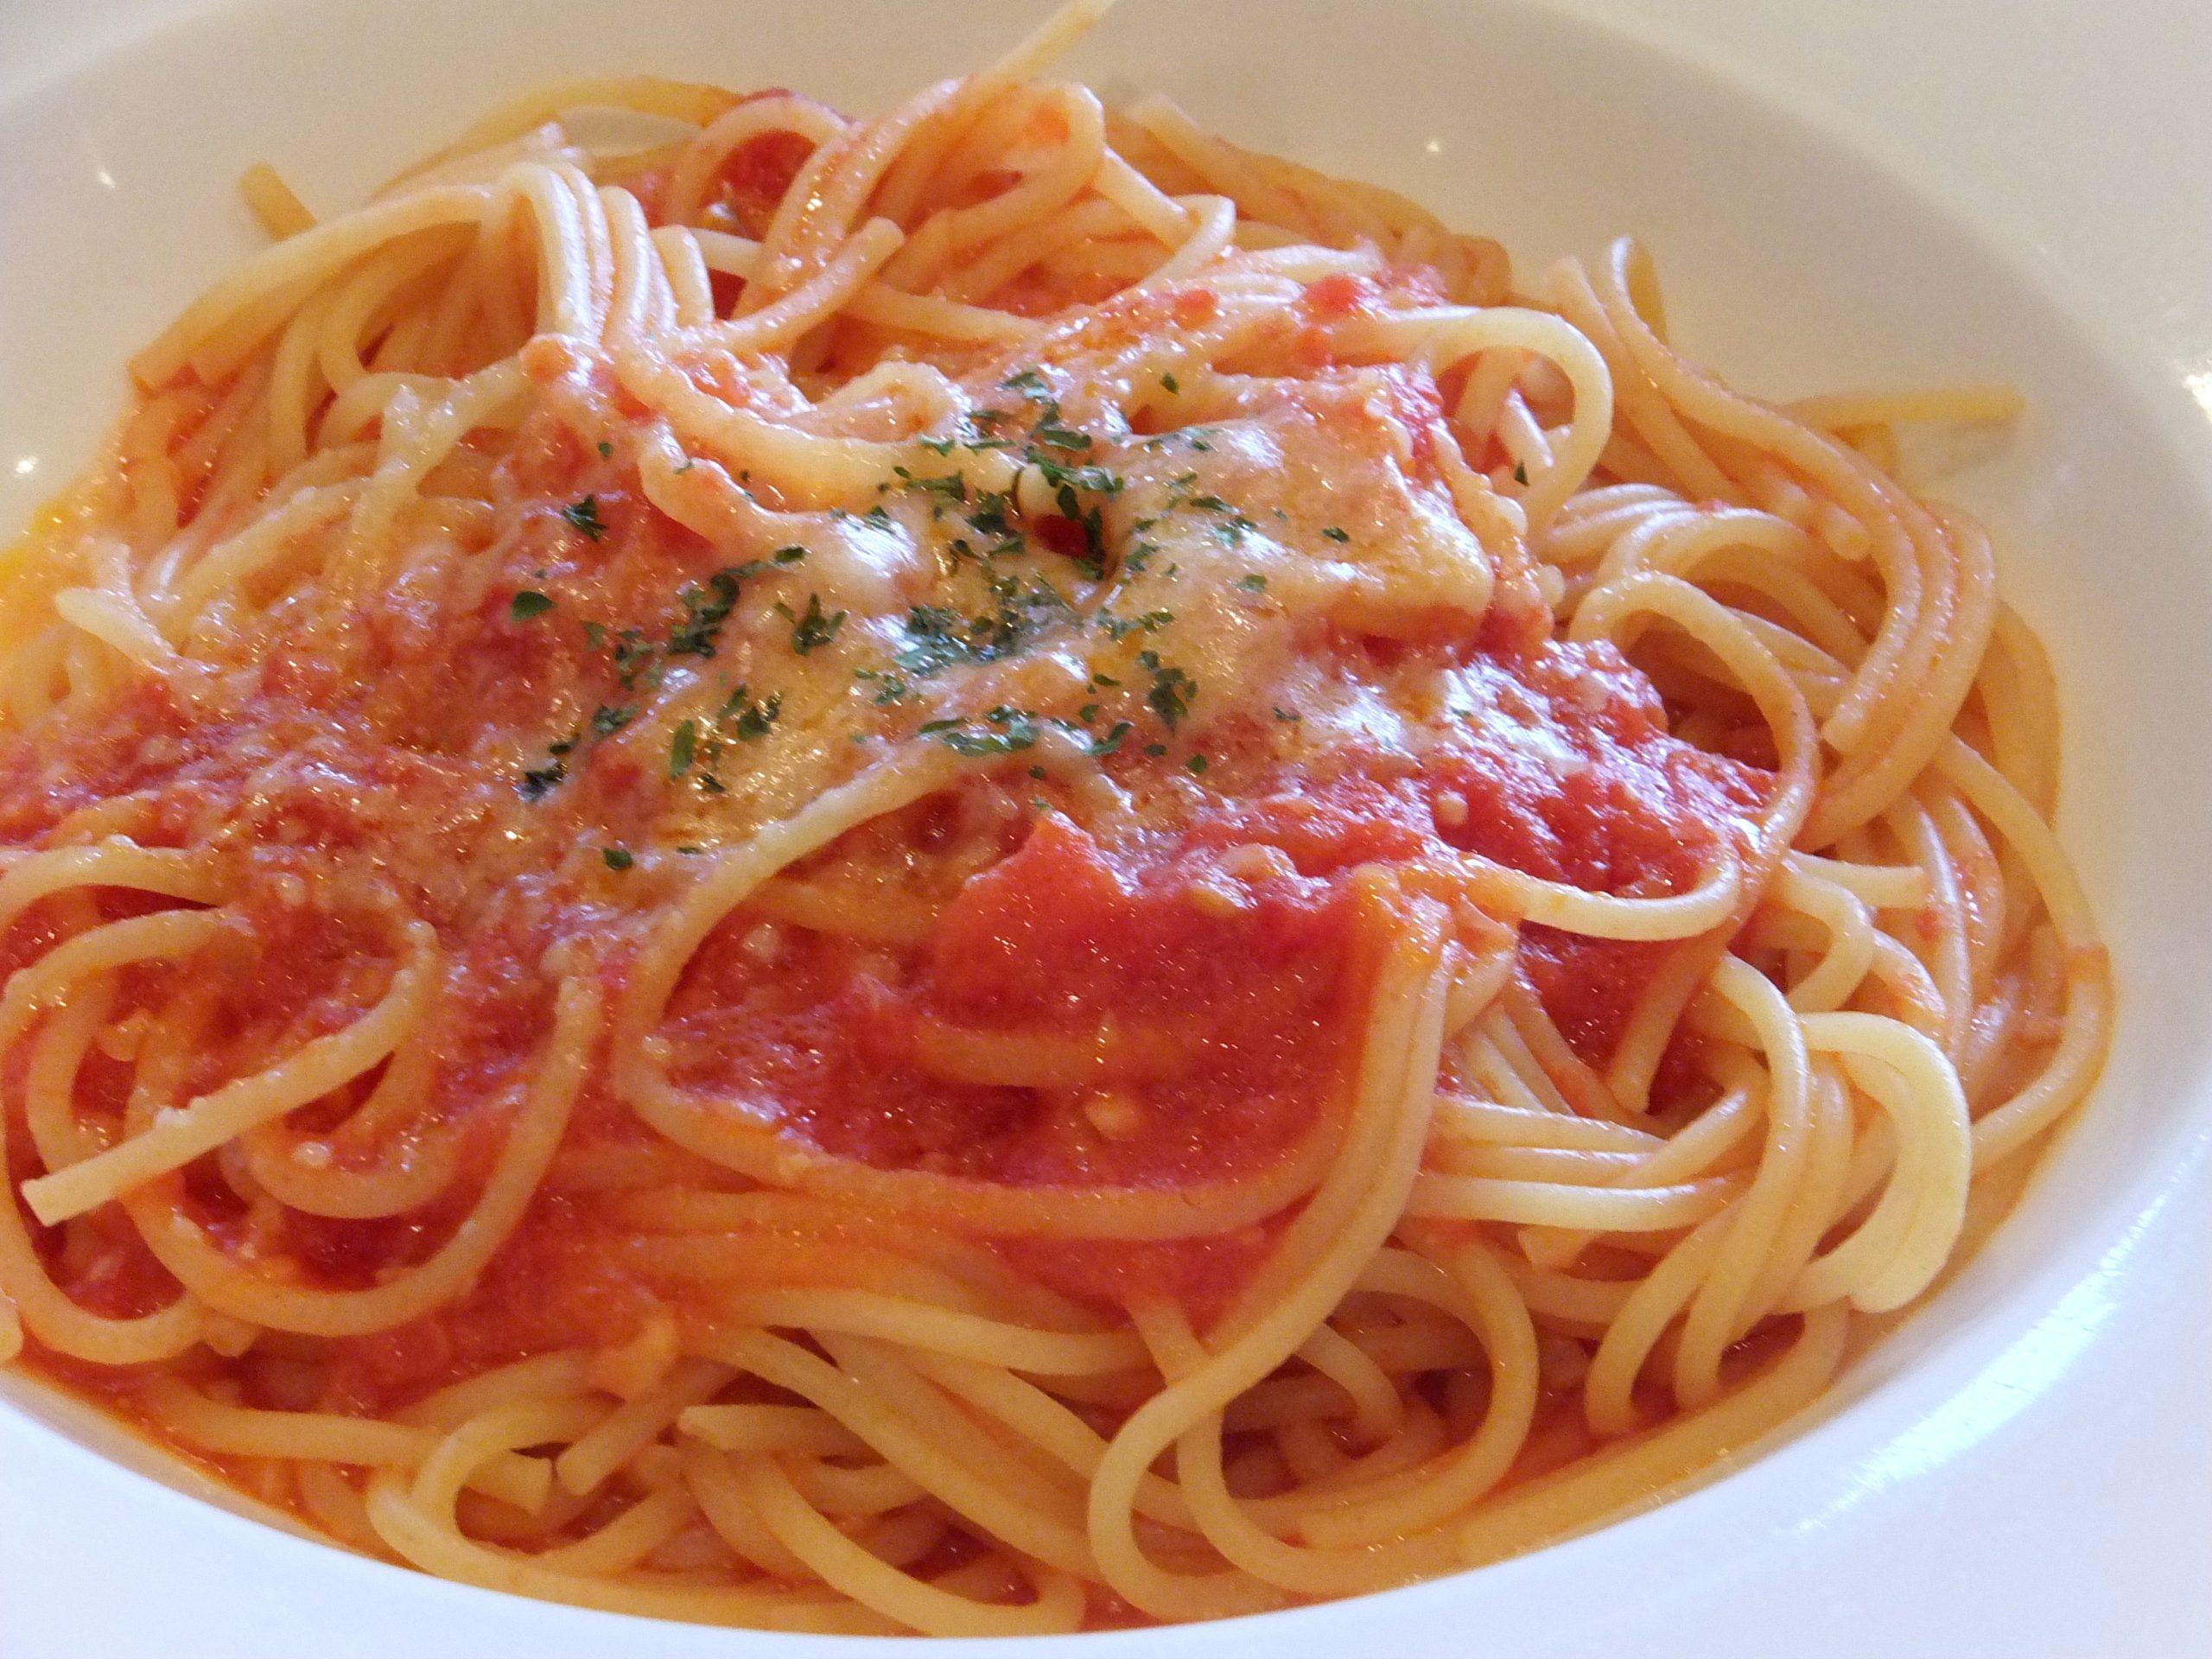 Kids Menu Spaghetti Tomato Sauce - Justino's Pizza